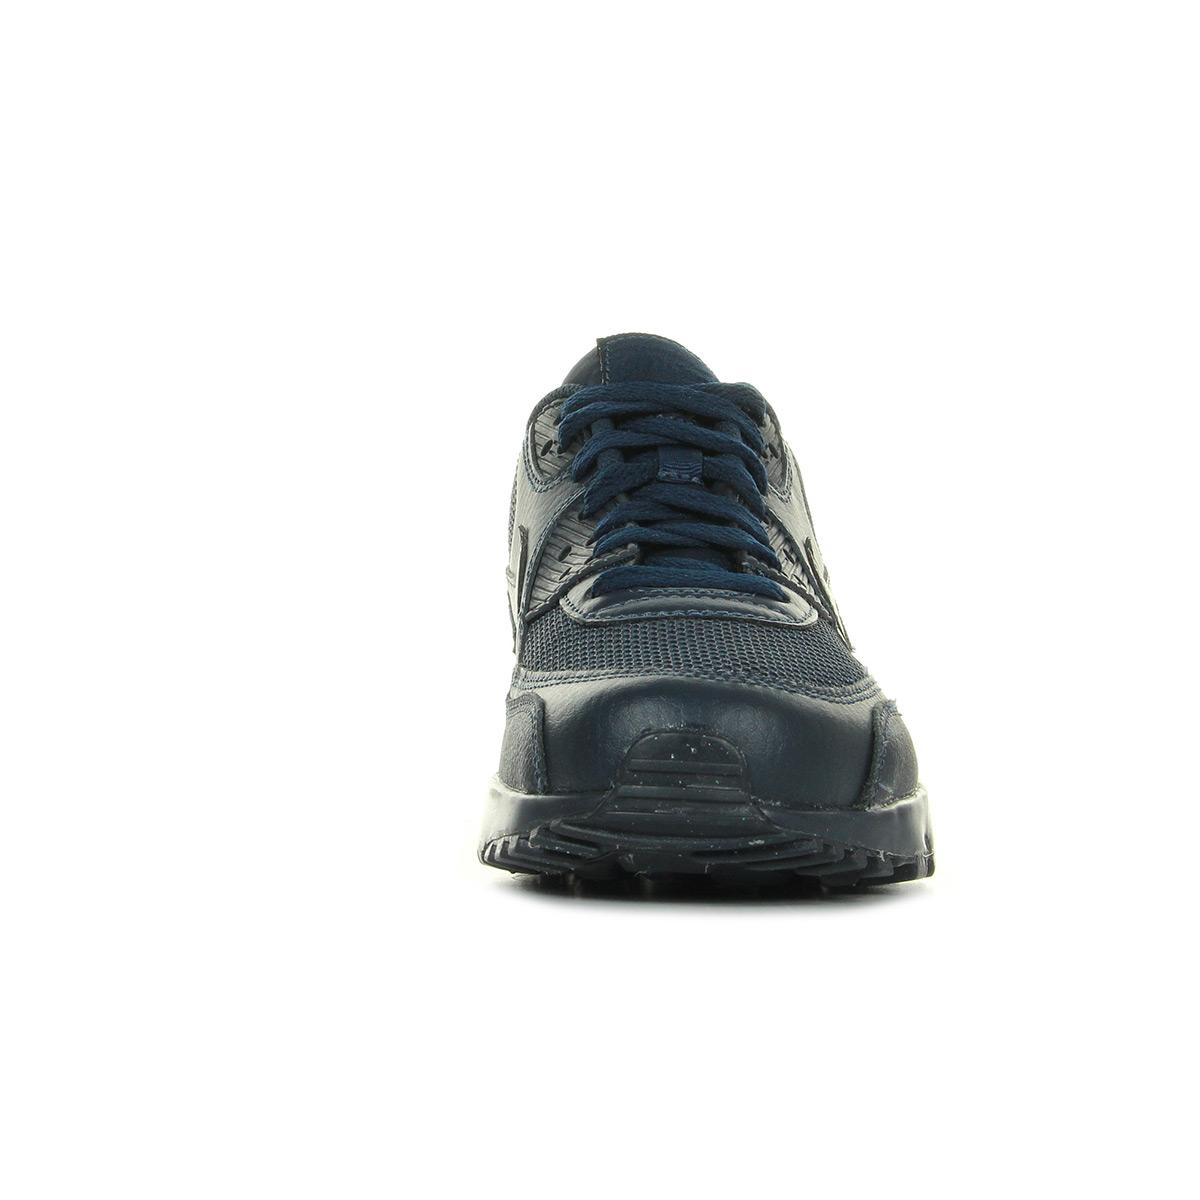 timeless design cce47 c5bd6 ... Nike Air Max 90 Mesh ...